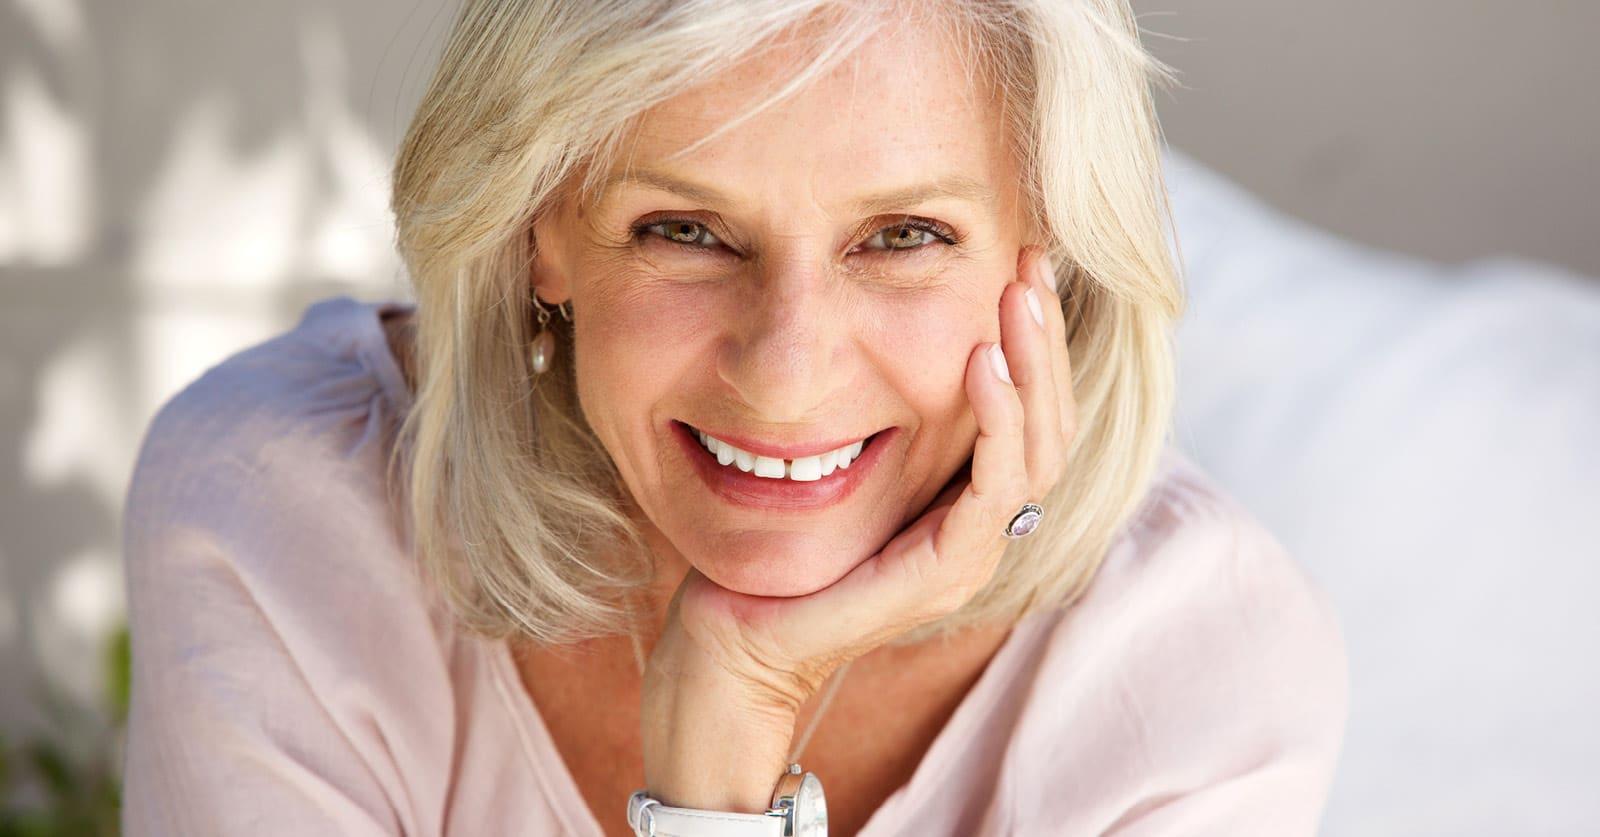 Plenopausia vs. menopausia